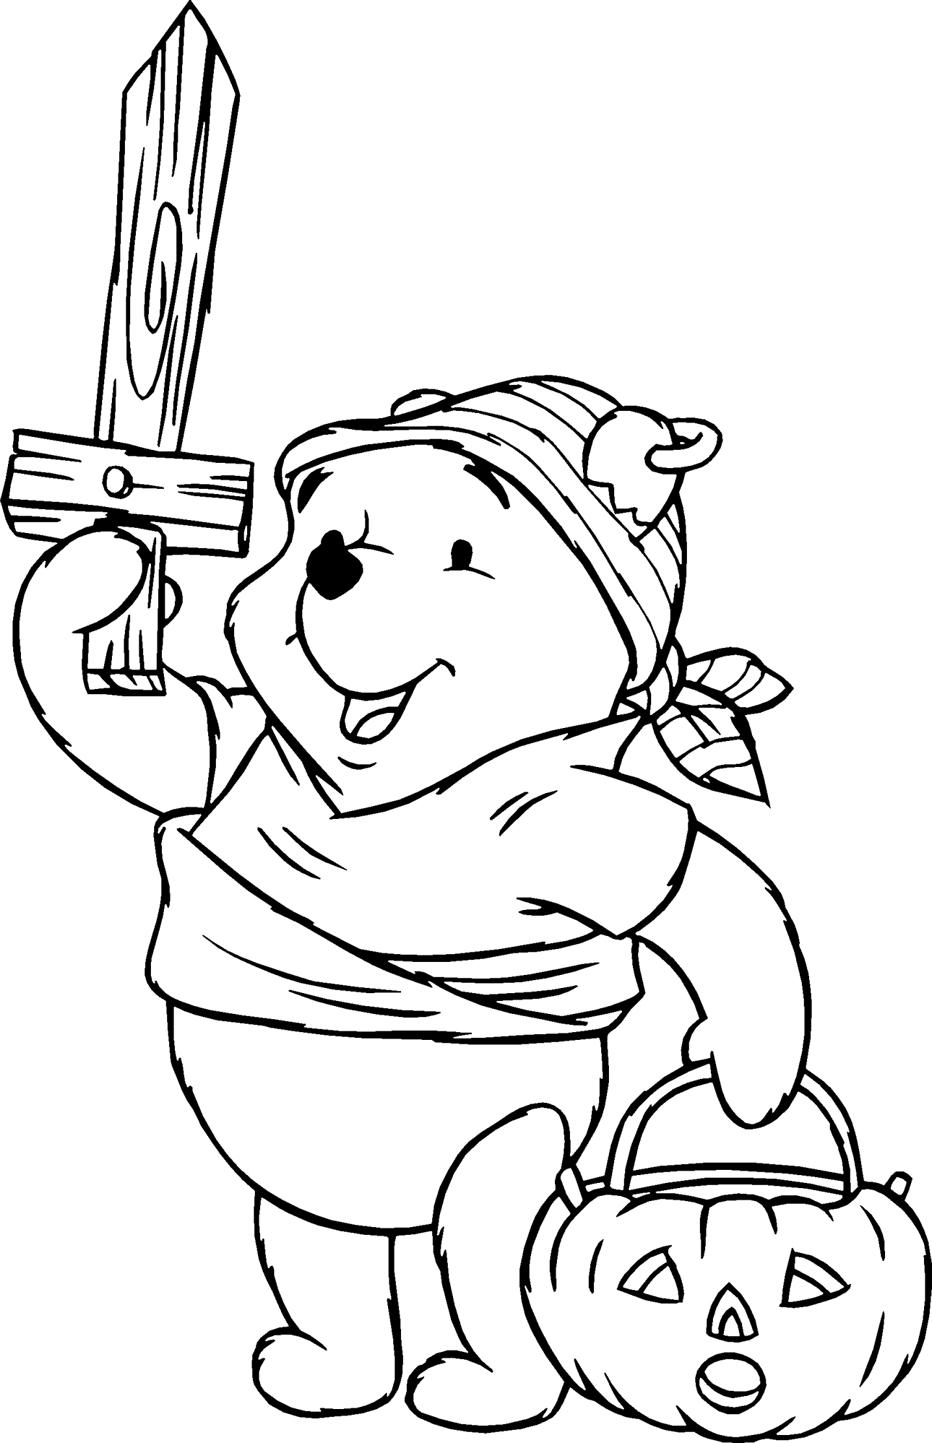 Imagenes de dibujos de winnie pooh